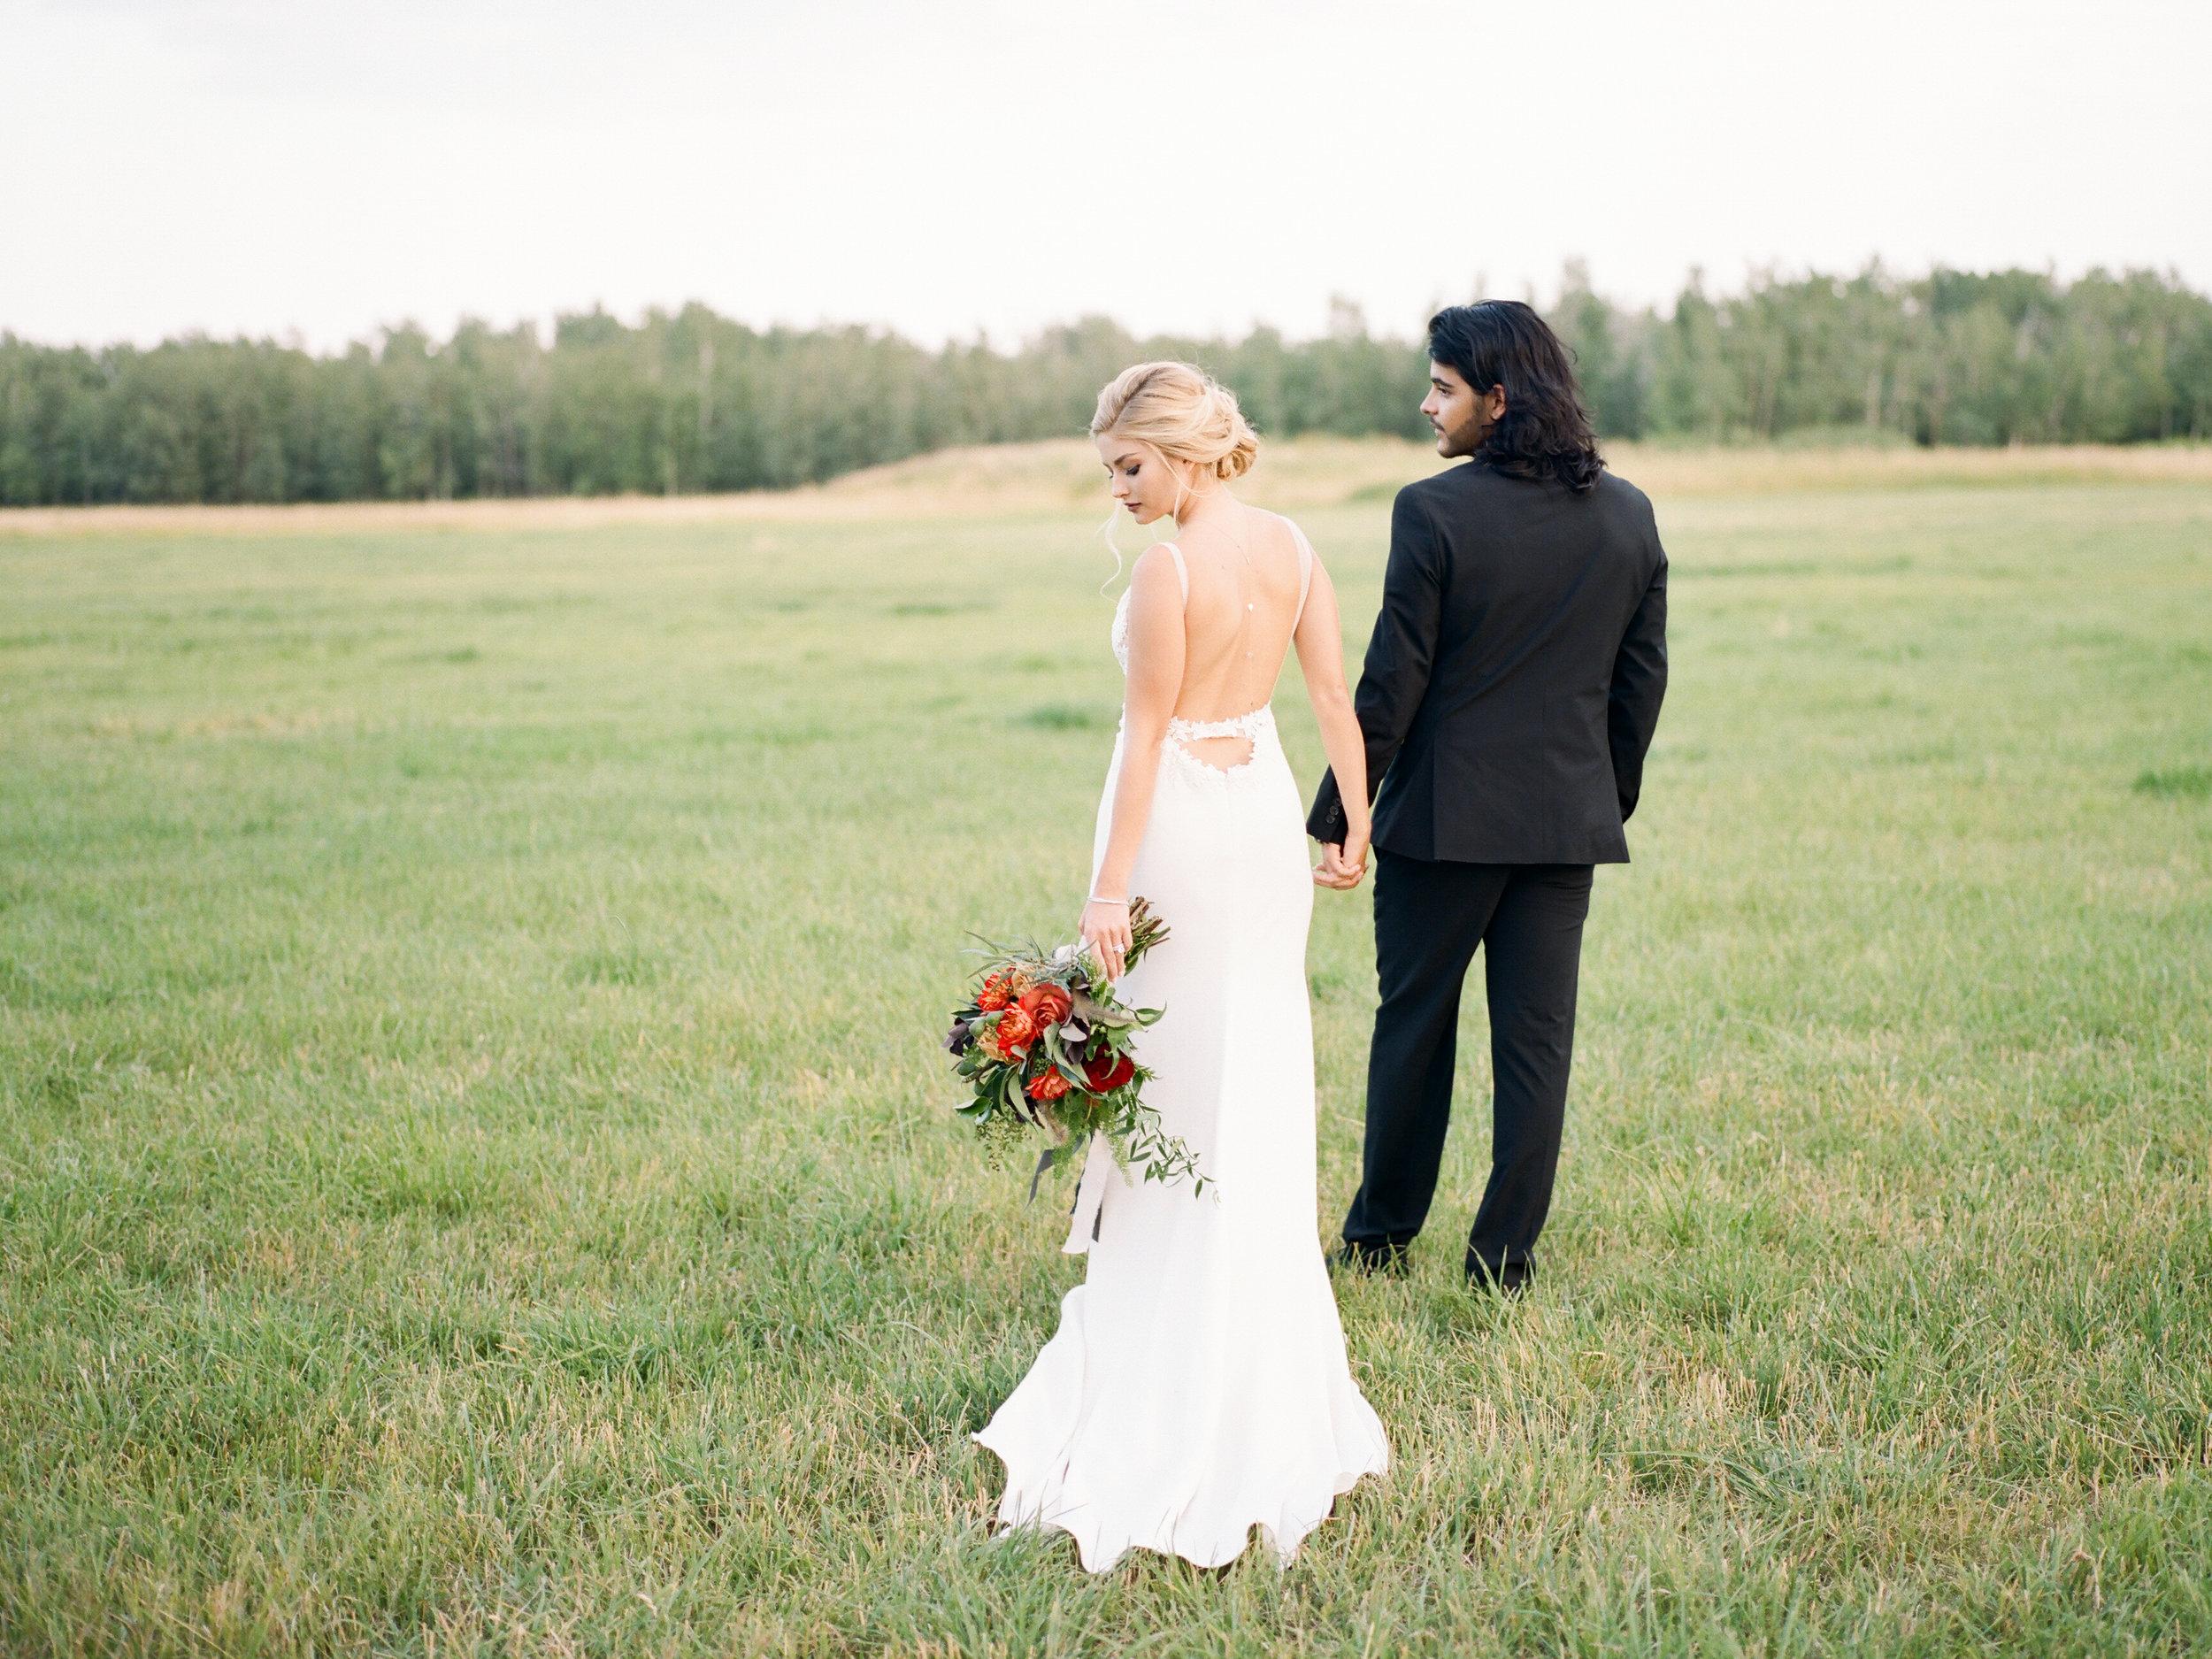 Bozeman-Big Sky-Montana-wedding-engagement-family-photographer-0150.jpg